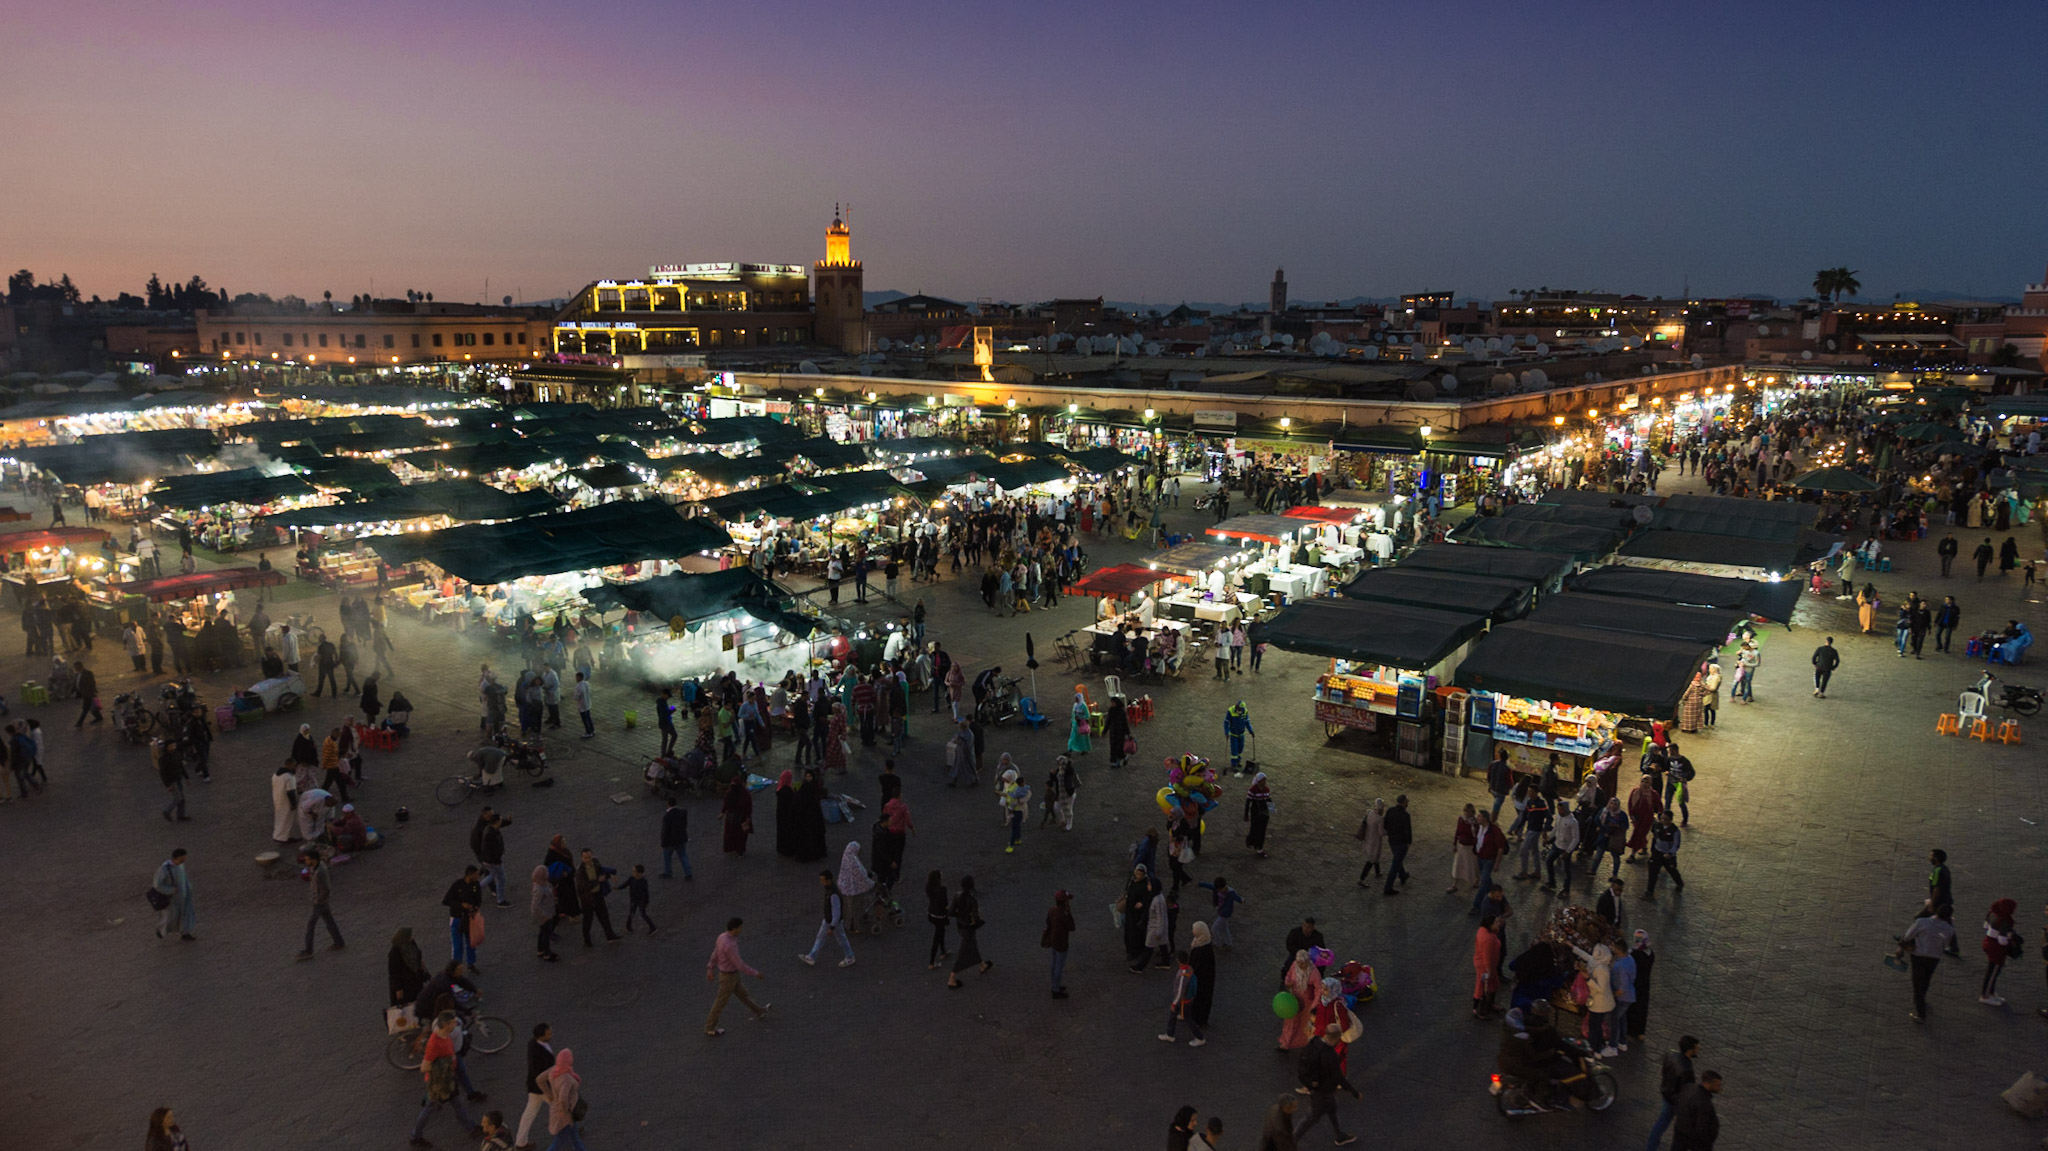 Marrakech Cafe on Jamaa El-Fna, Morocco